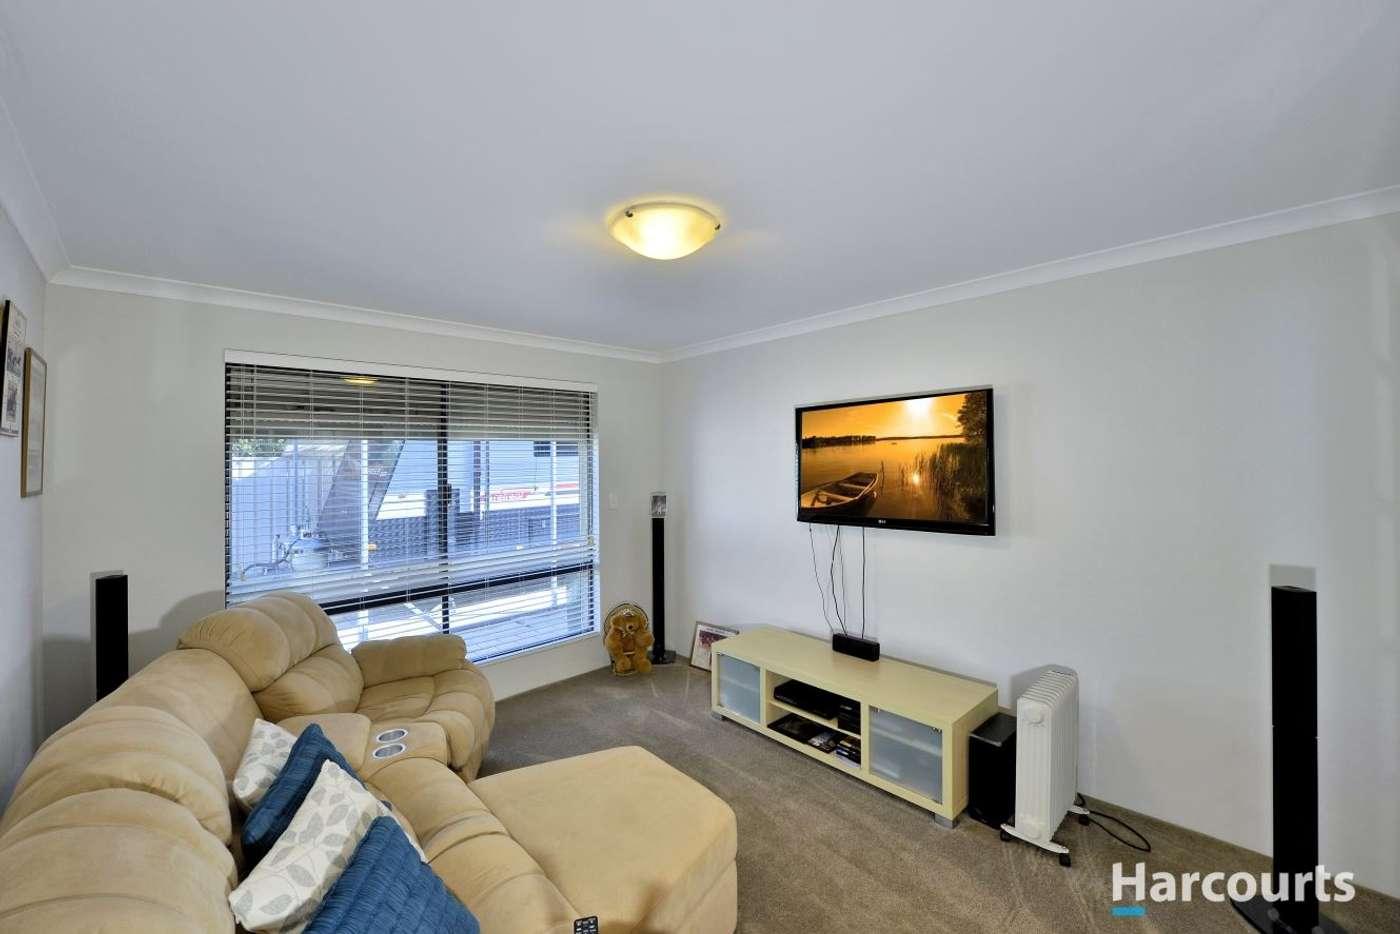 Sixth view of Homely house listing, 61 Nancarrow Way, Ravenswood WA 6208